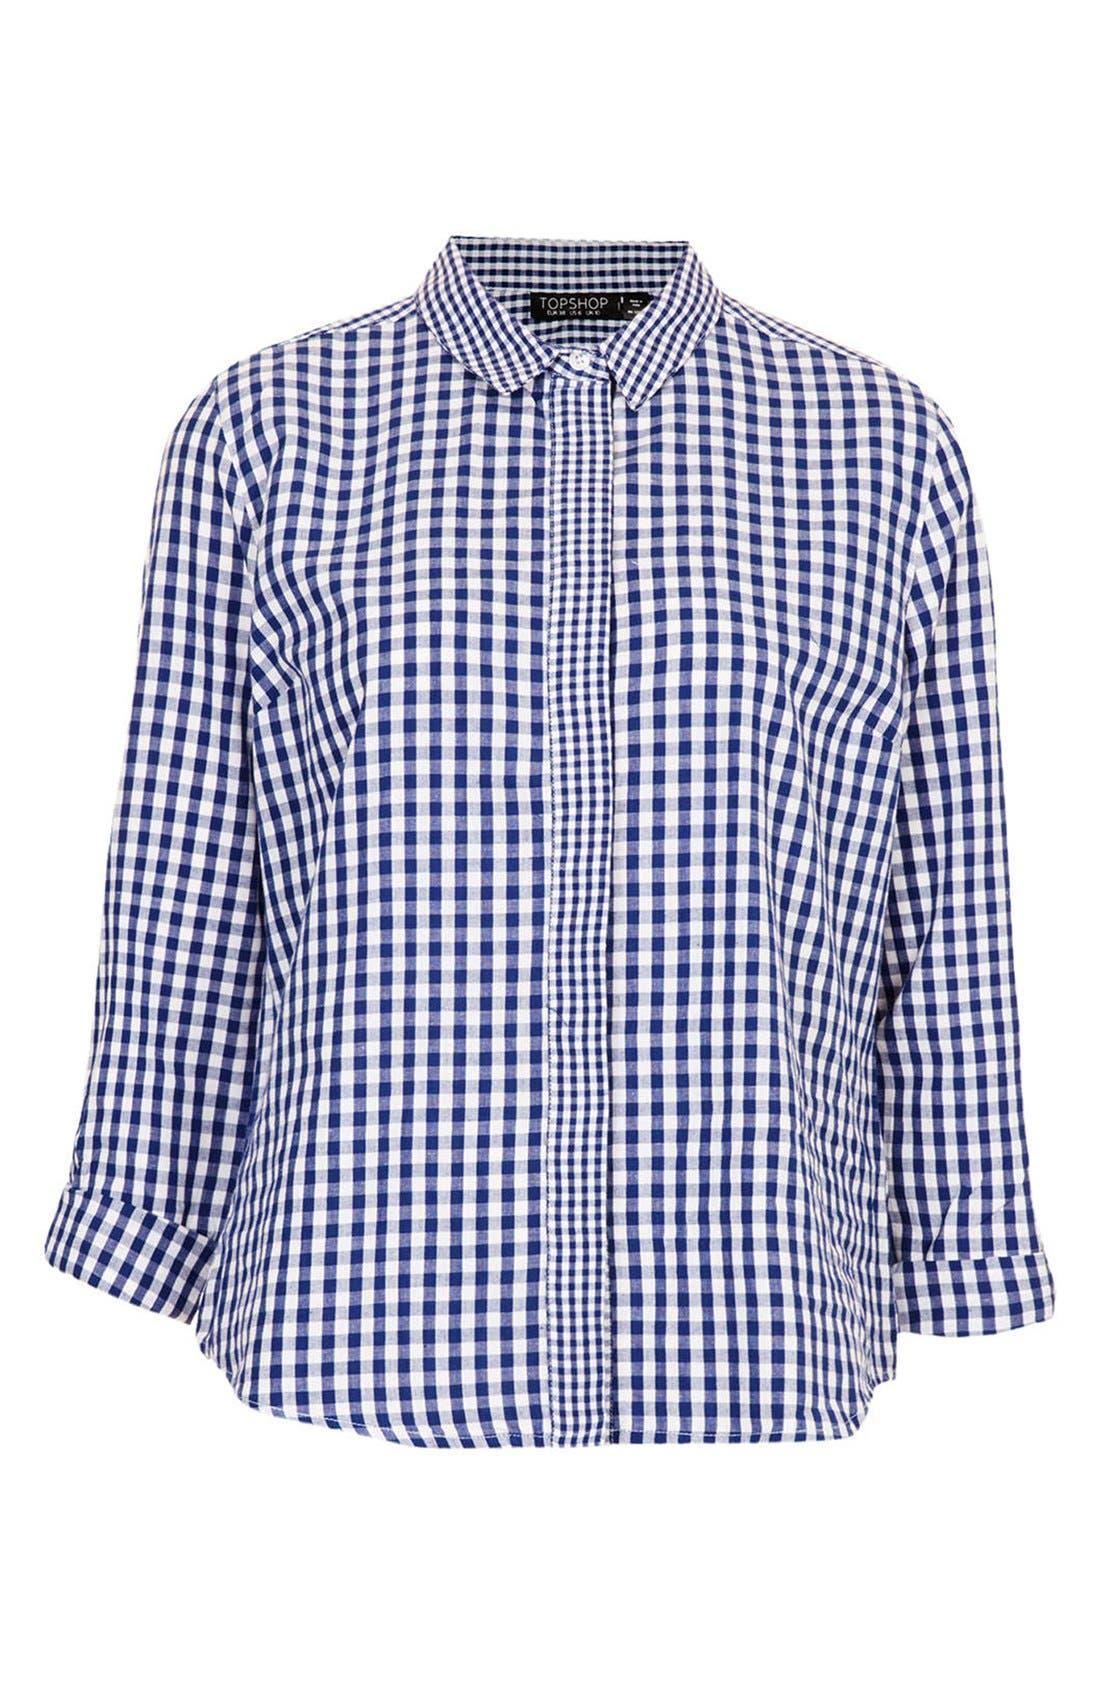 Alternate Image 3  - Topshop Mix Gingham Print Cotton Shirt